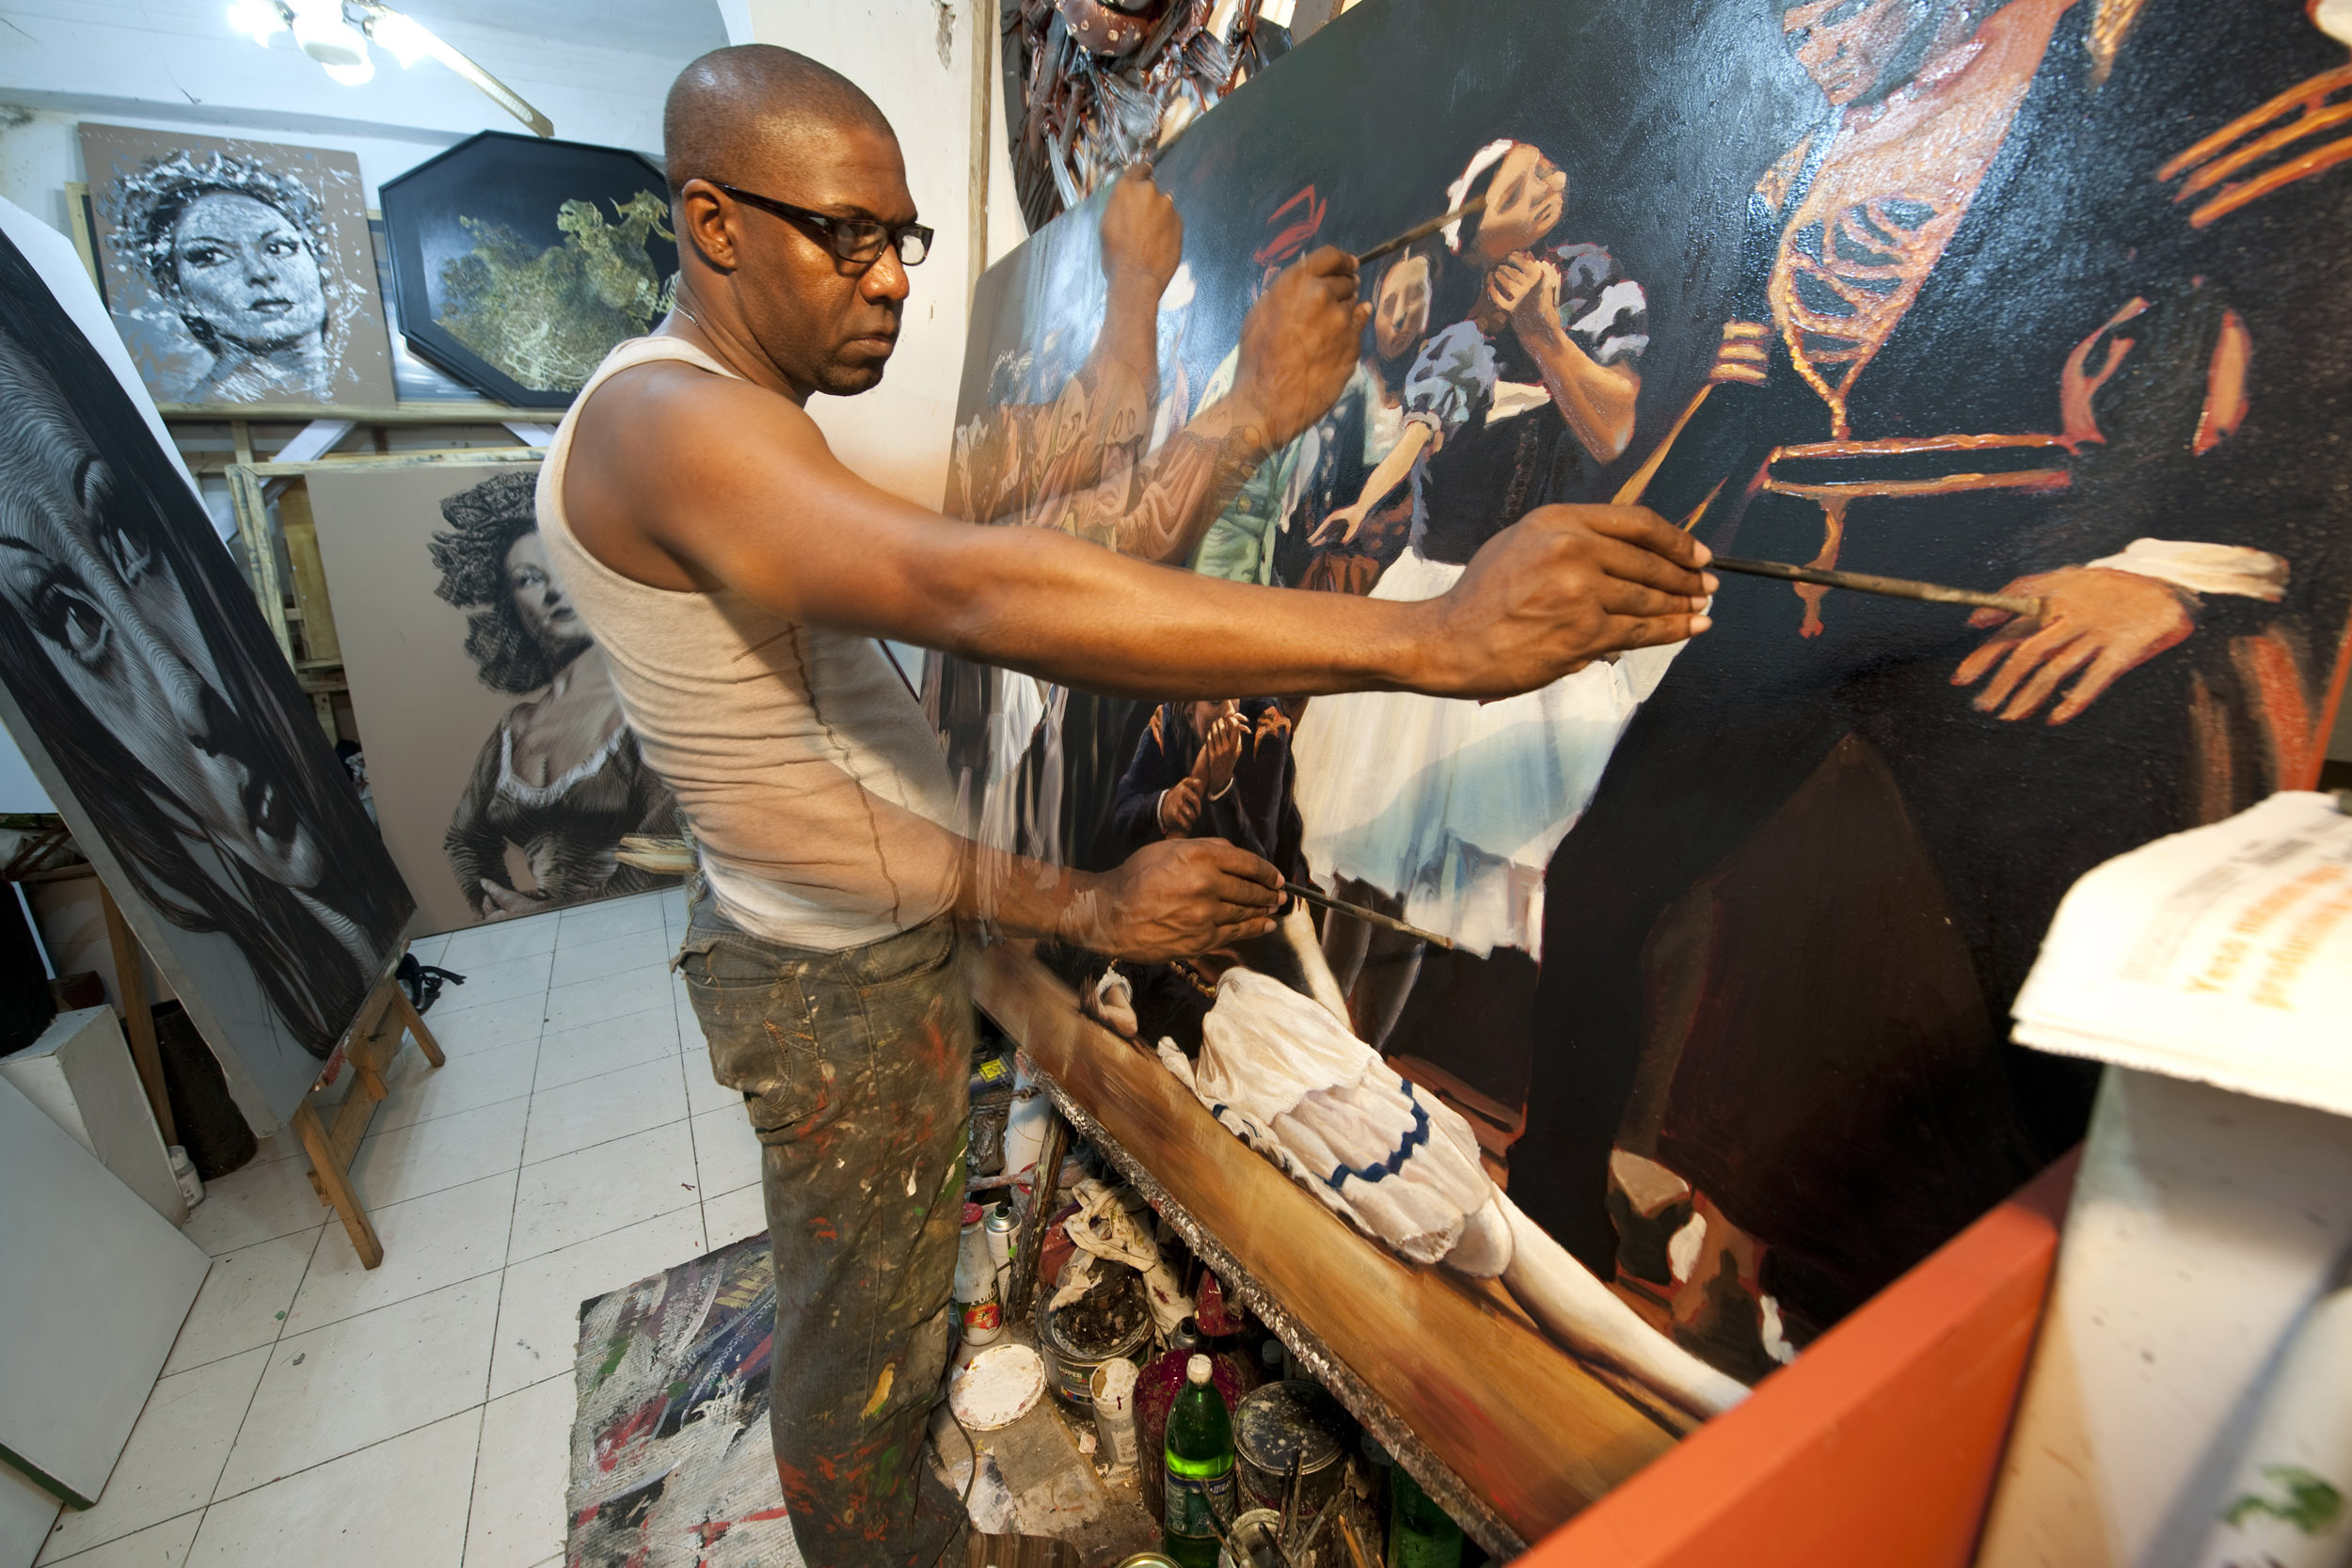 Jesús Lara, painter - Illuminated Cuba - Hector Garrido, Aerial and human photography